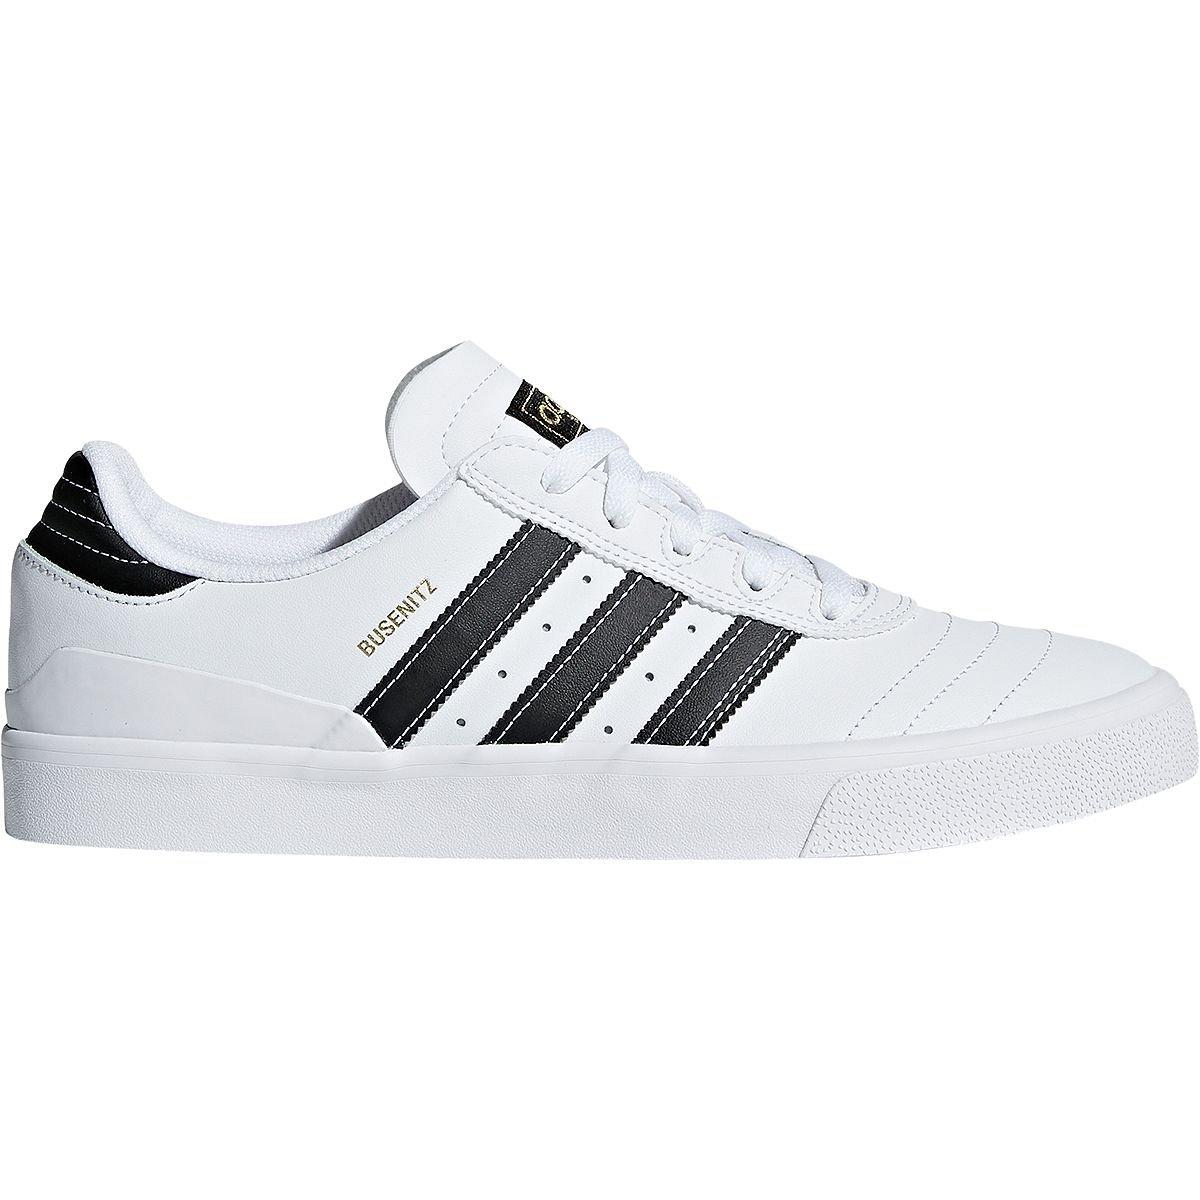 adidas Originals Men's Busenitz Vulc Fashion Sneaker 12.5 D(M) US|Footwear White/Core Black/Gold Metallic